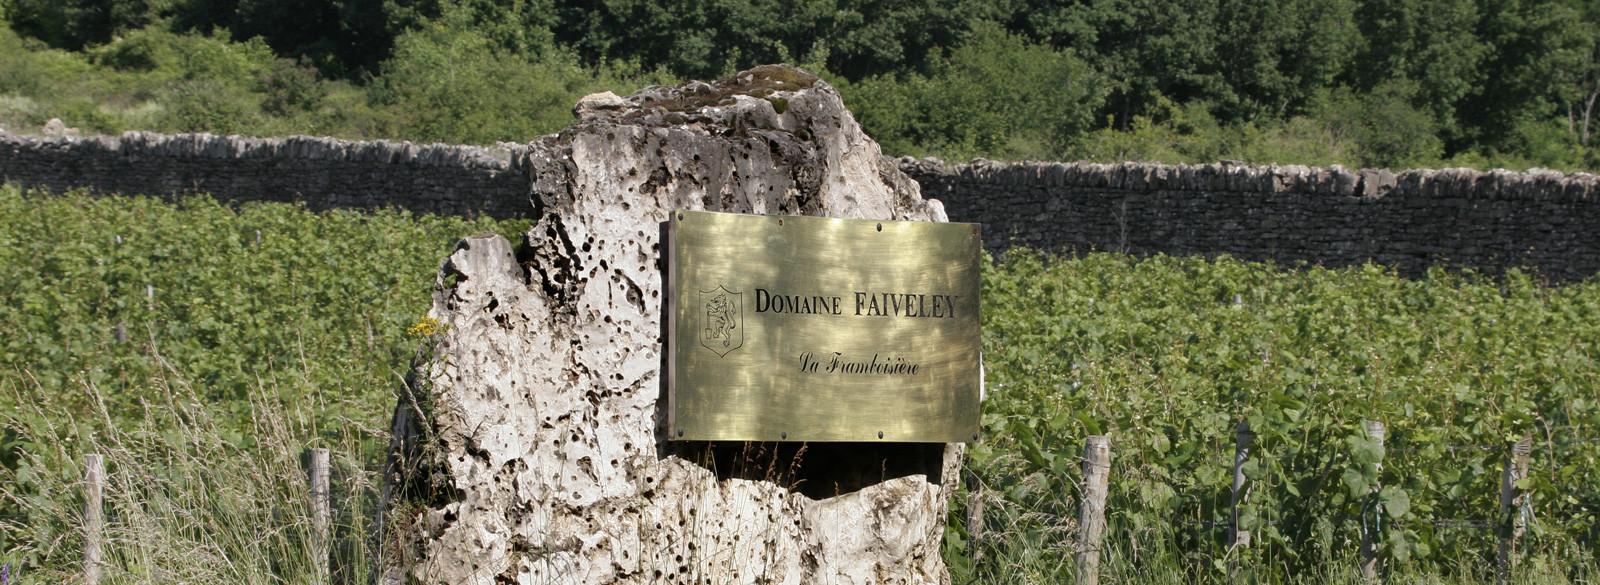 Leer la etiqueta de un Borgoña